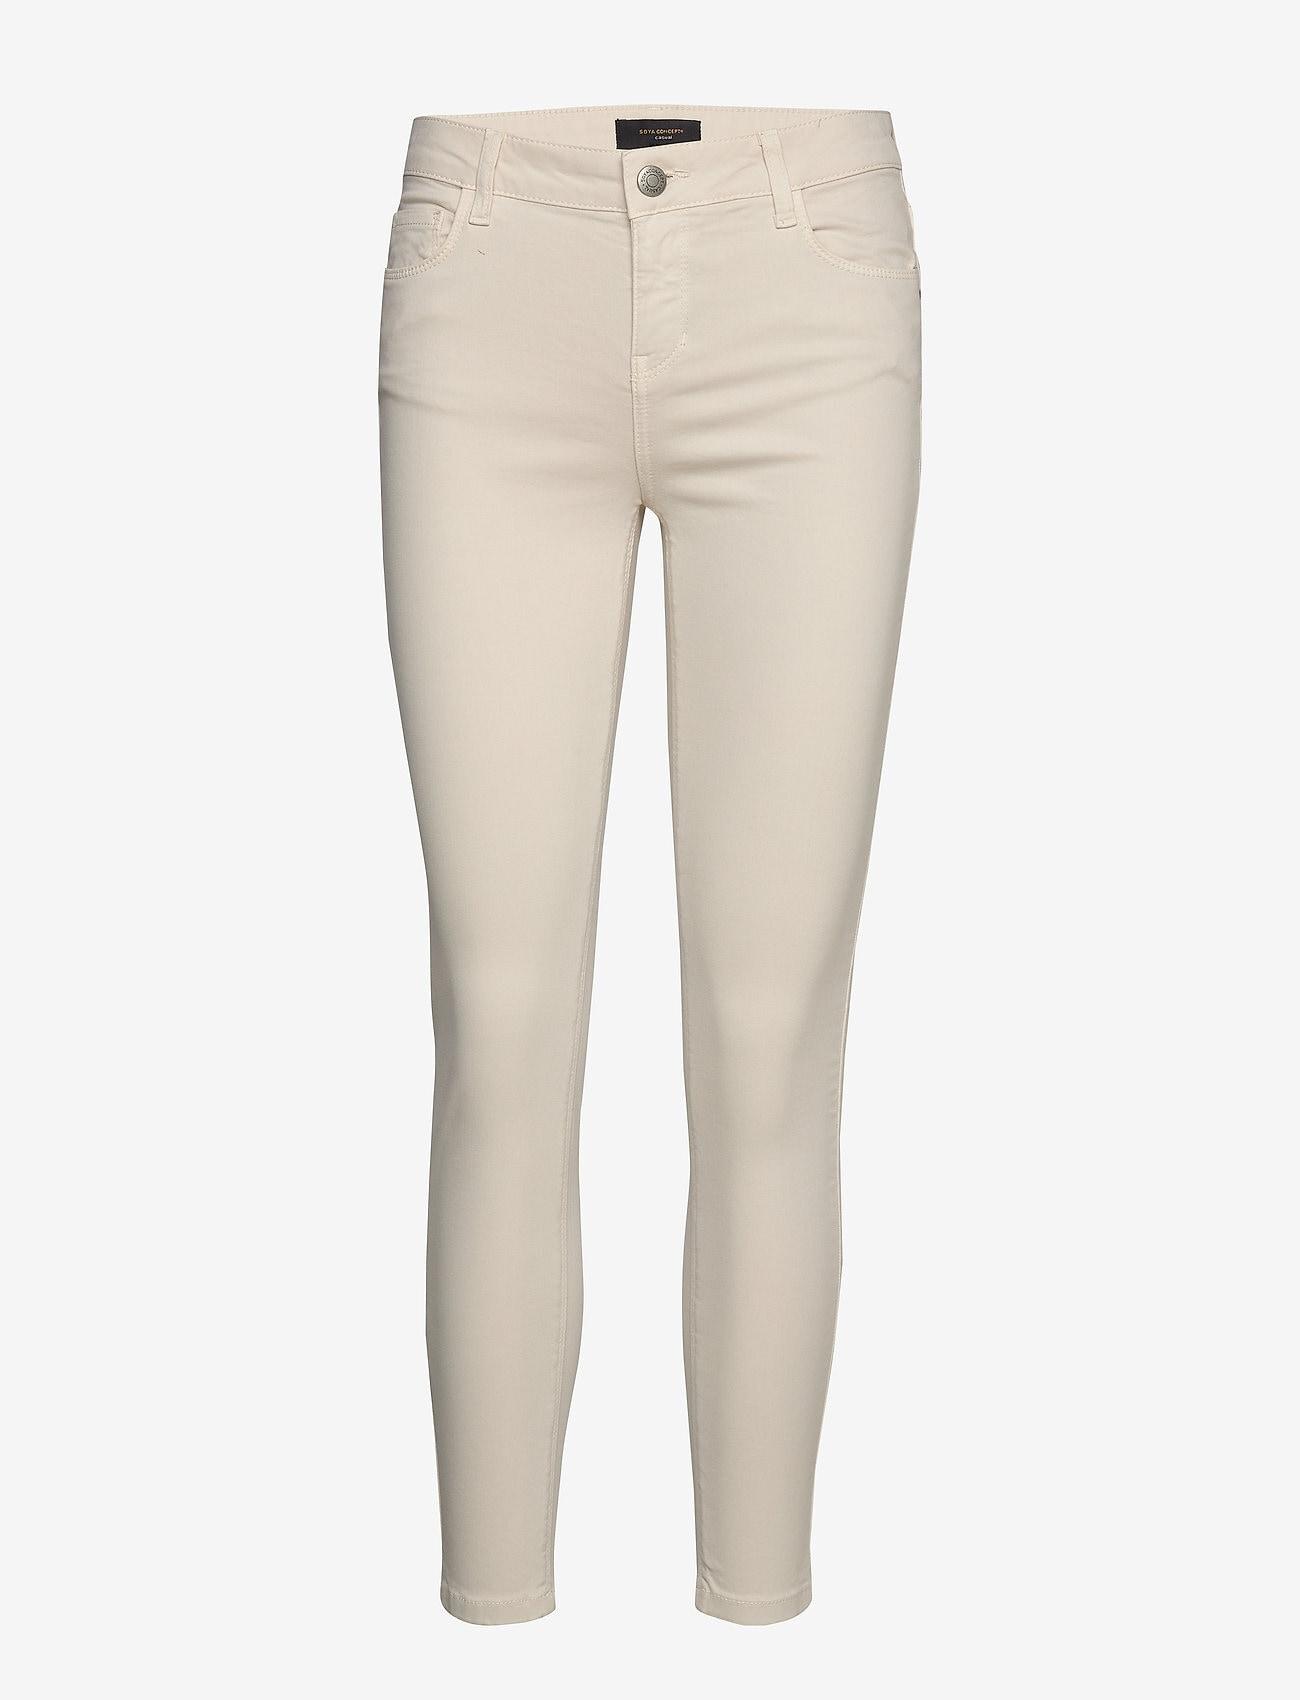 Patrizia 4B Jeans - Cream